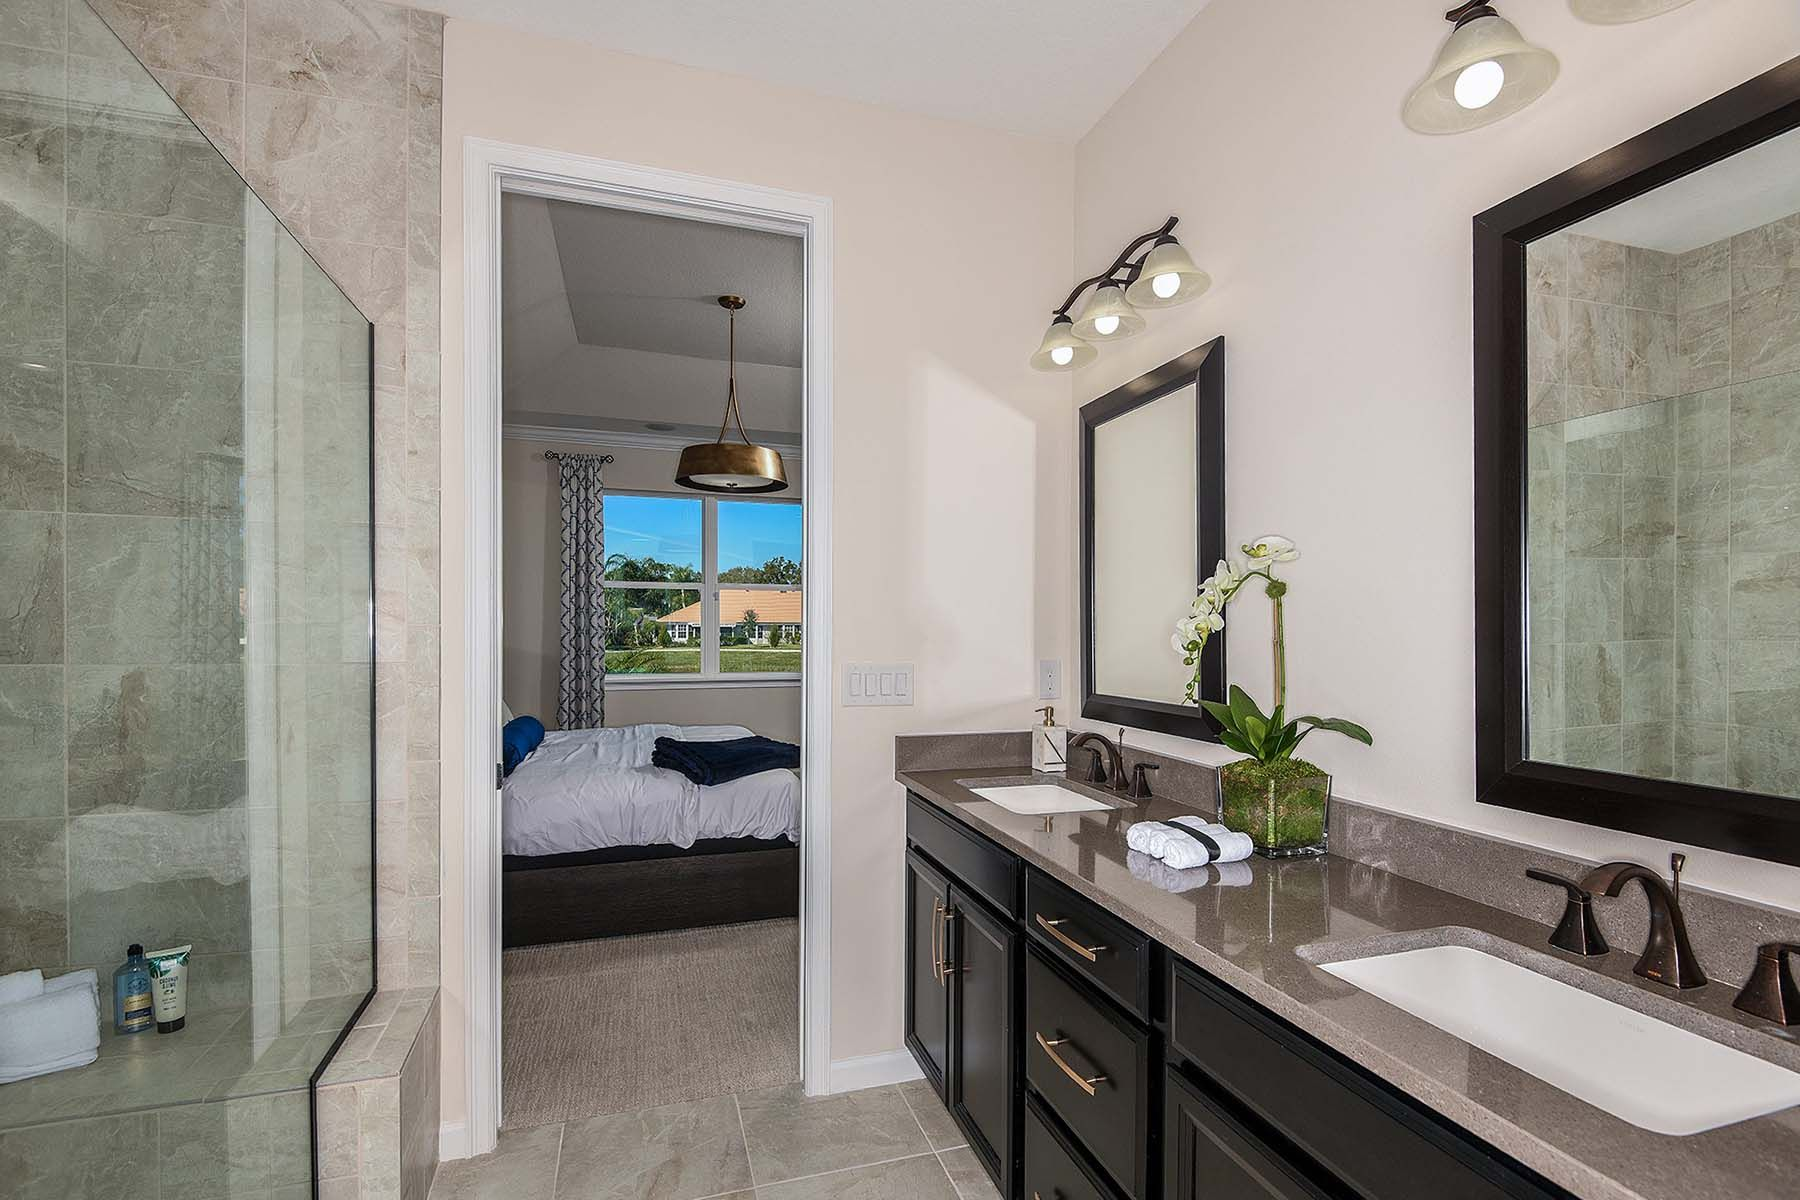 Bathroom featured in the Bayport By Mattamy Homes in Sarasota-Bradenton, FL